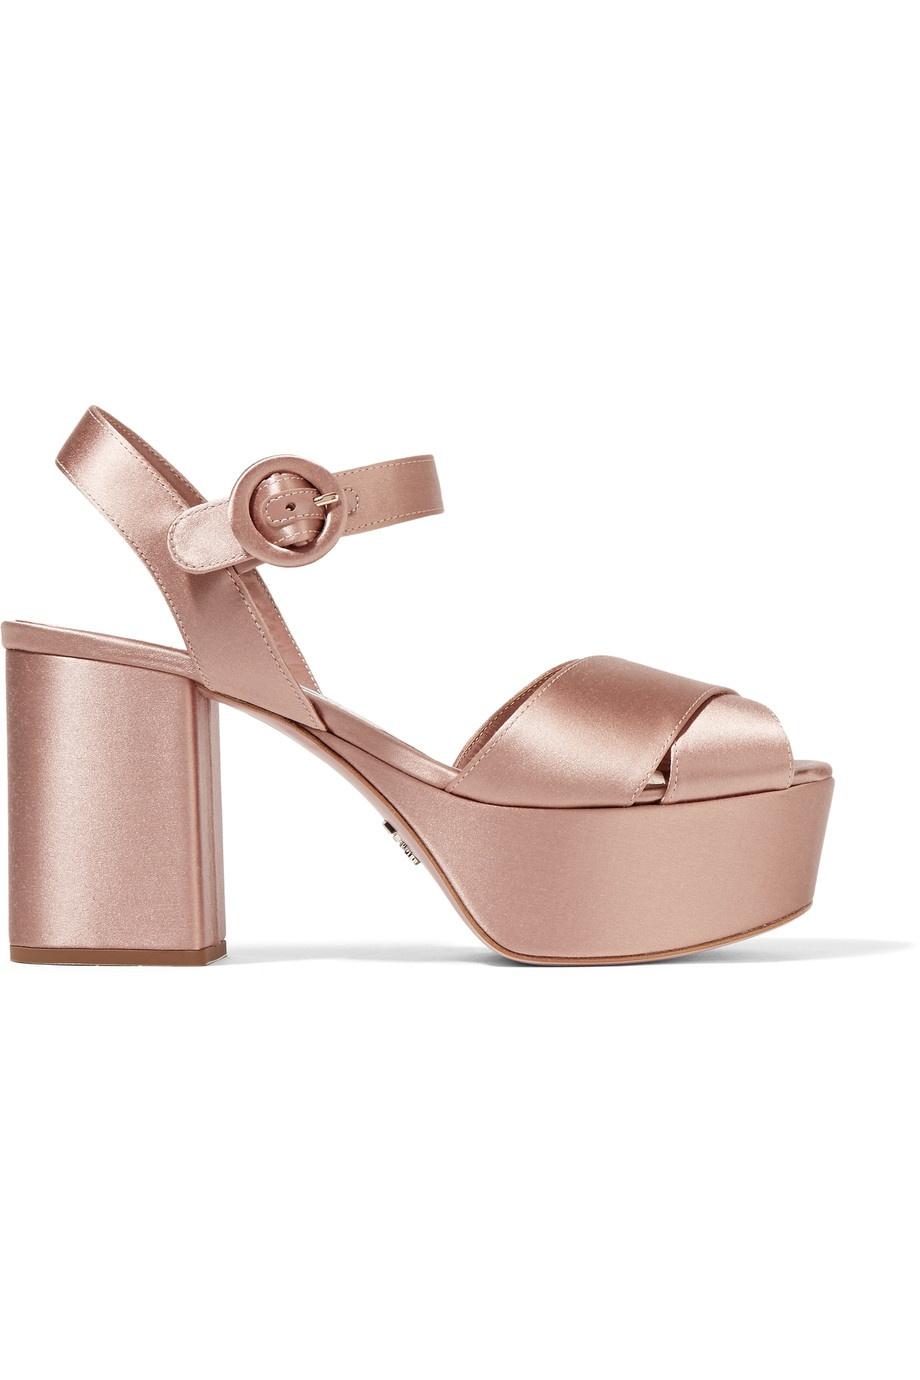 PRADA - Satin platform sandals